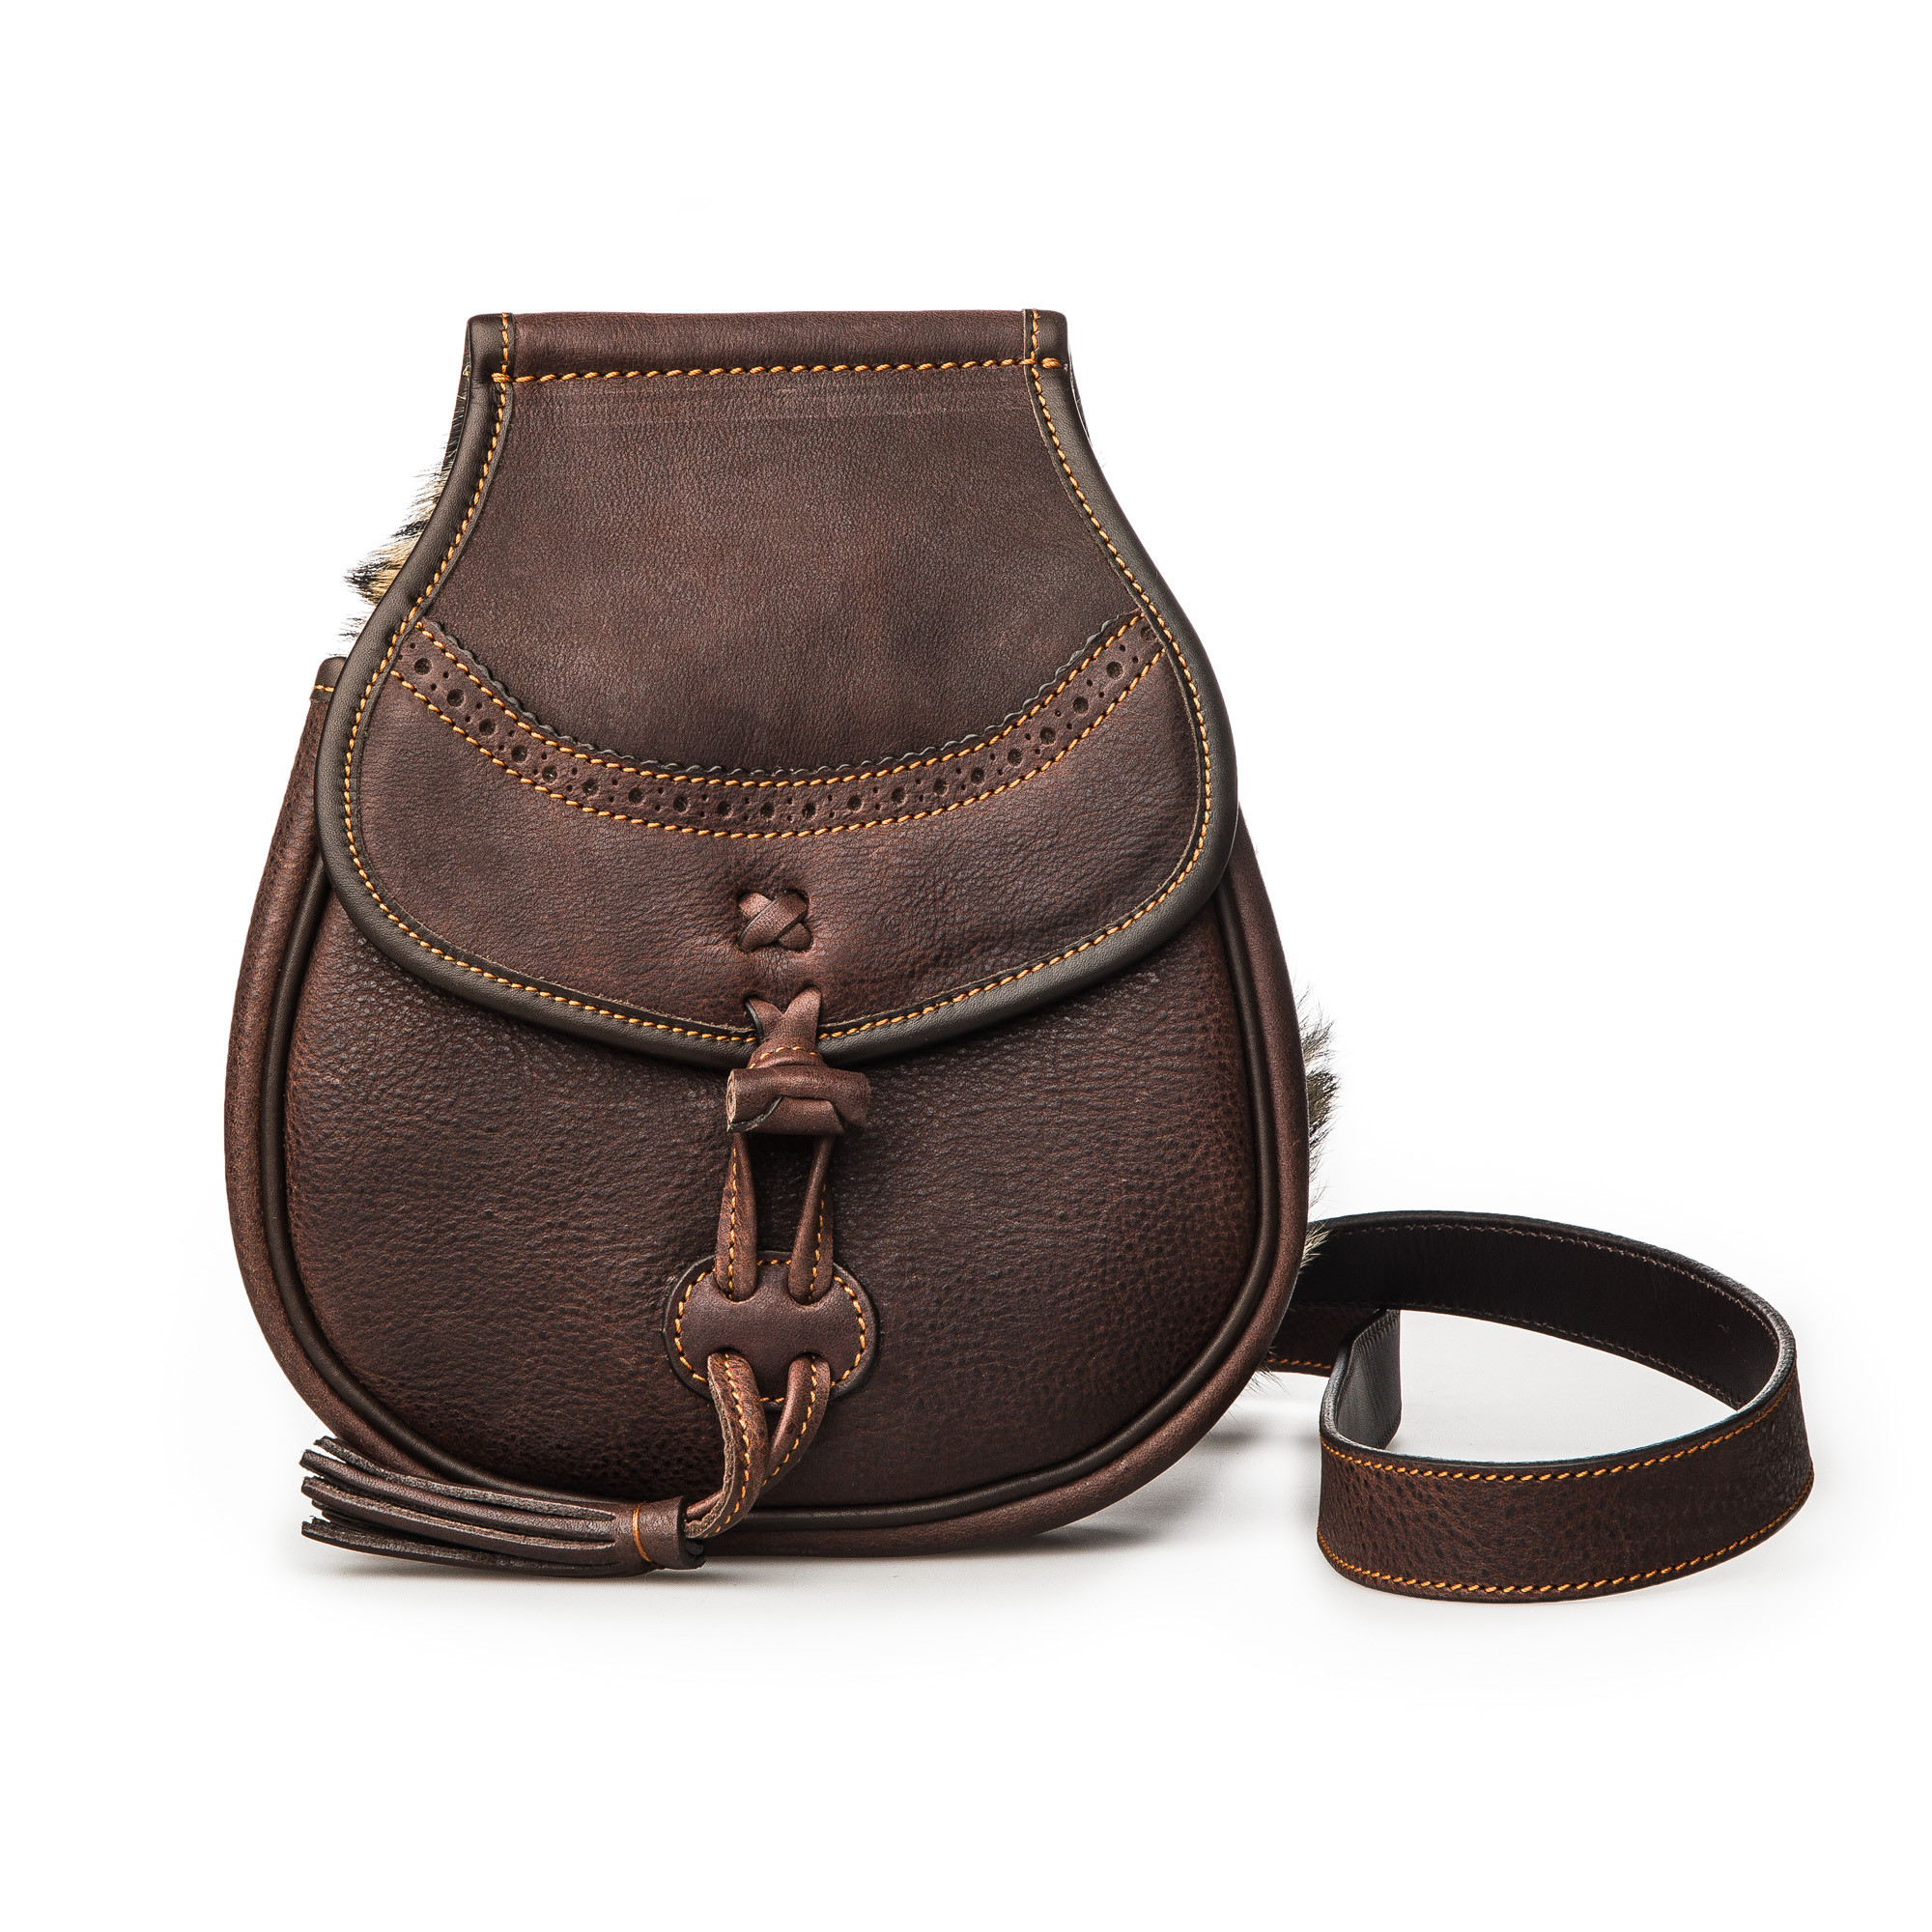 2c3cb2cd0 T.ba Leather & Fur Hand Warming Bag - Chocolate | W.R. & Co Ltd